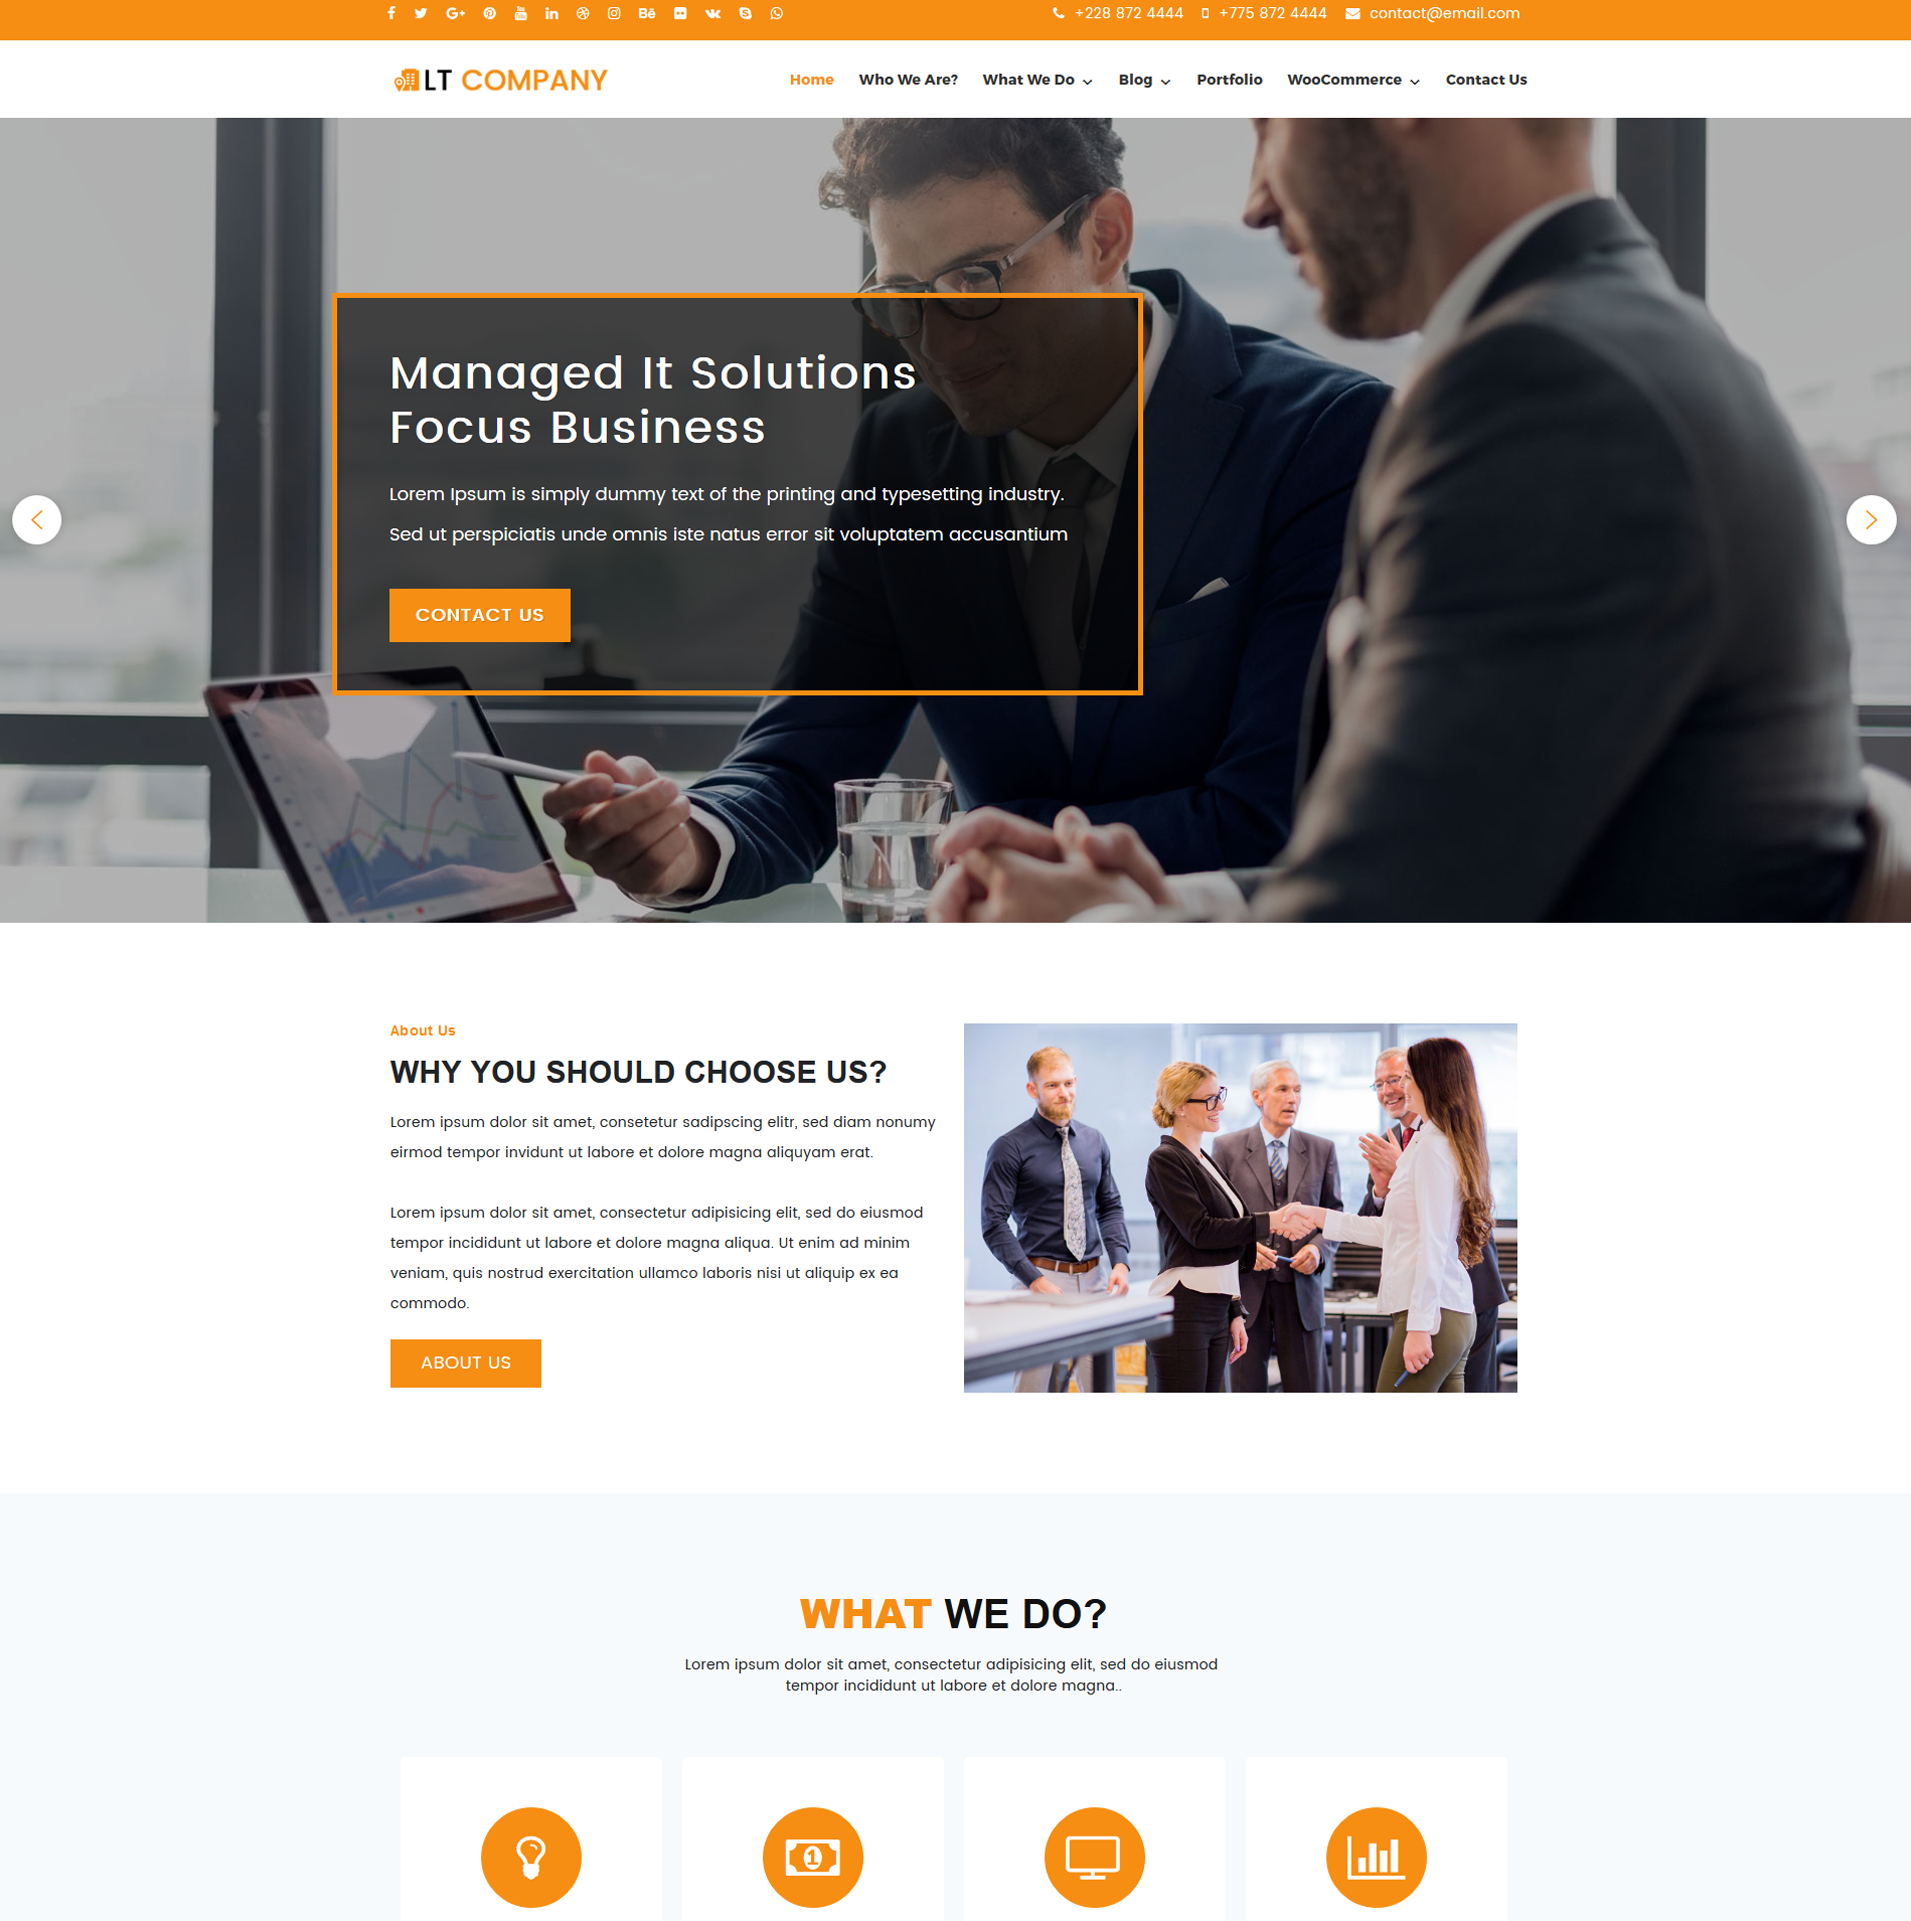 lt-company-free-responsive-wordpress-theme